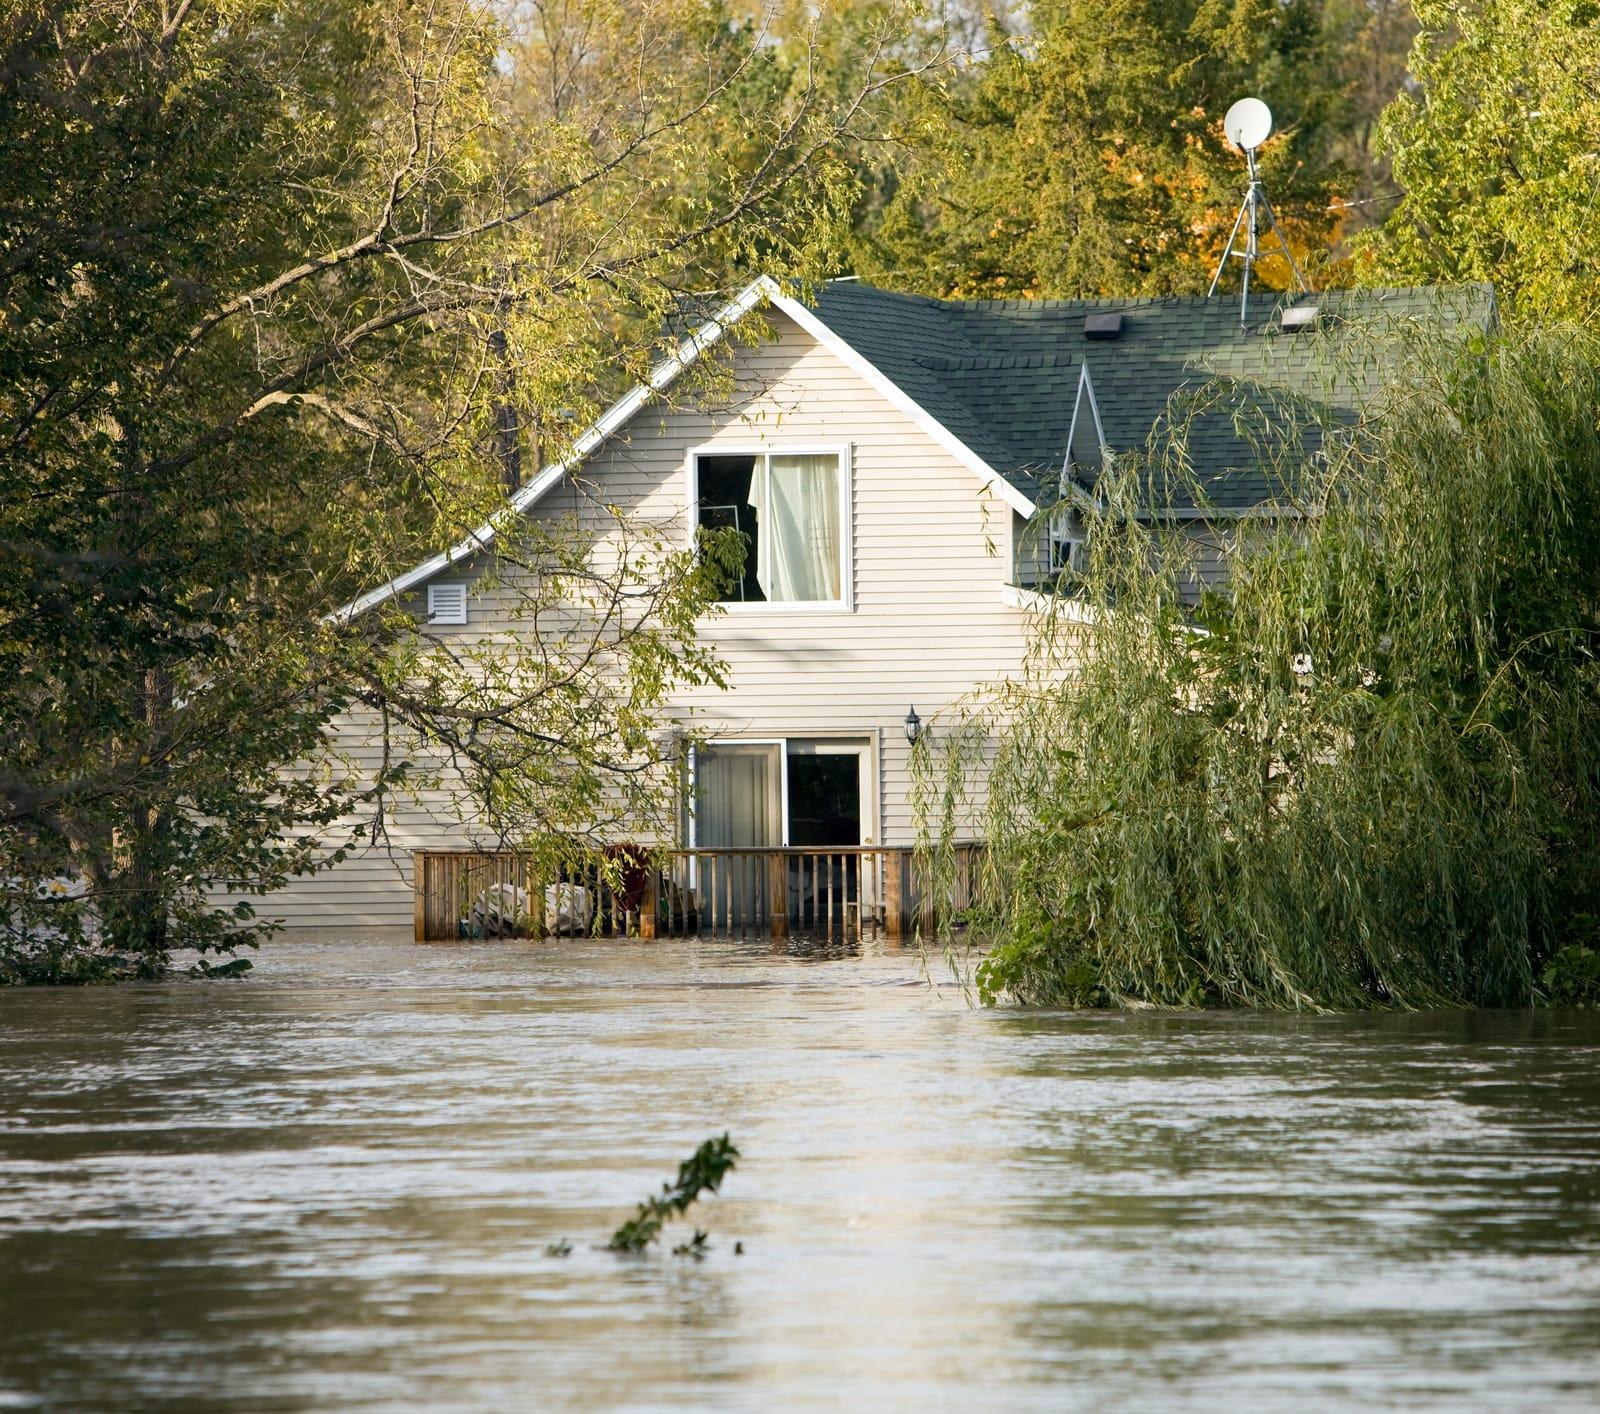 Average Cost of Flood Insurance 2019 - ValuePenguin